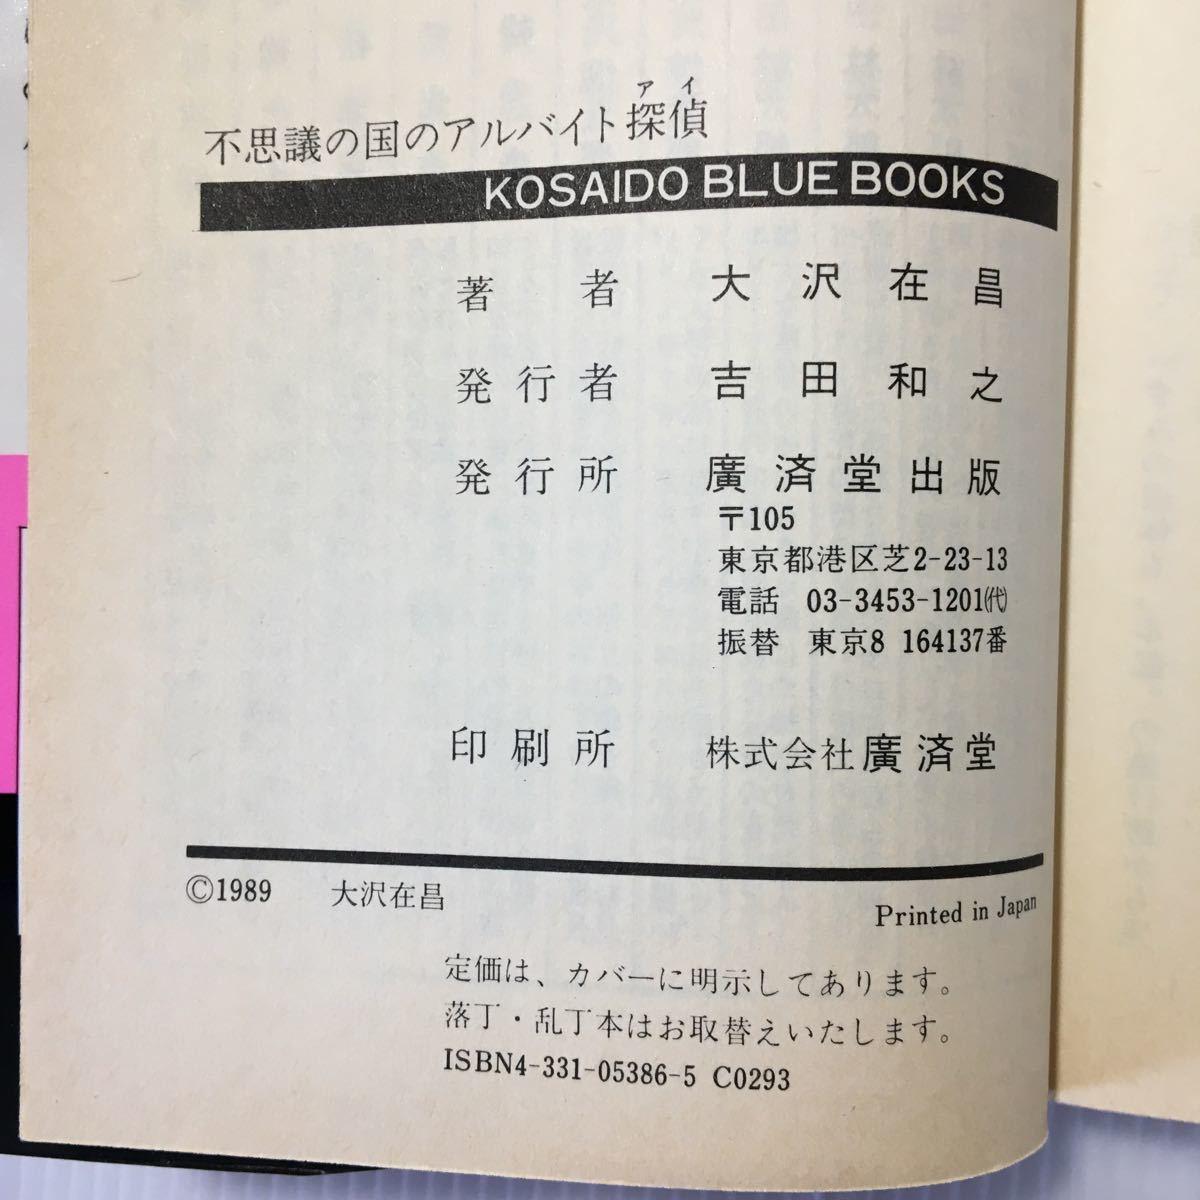 zaa-041★ 不思議の国のアルバイト探偵(アイ) (広済堂文庫) (文庫) 大沢 在昌 (著)